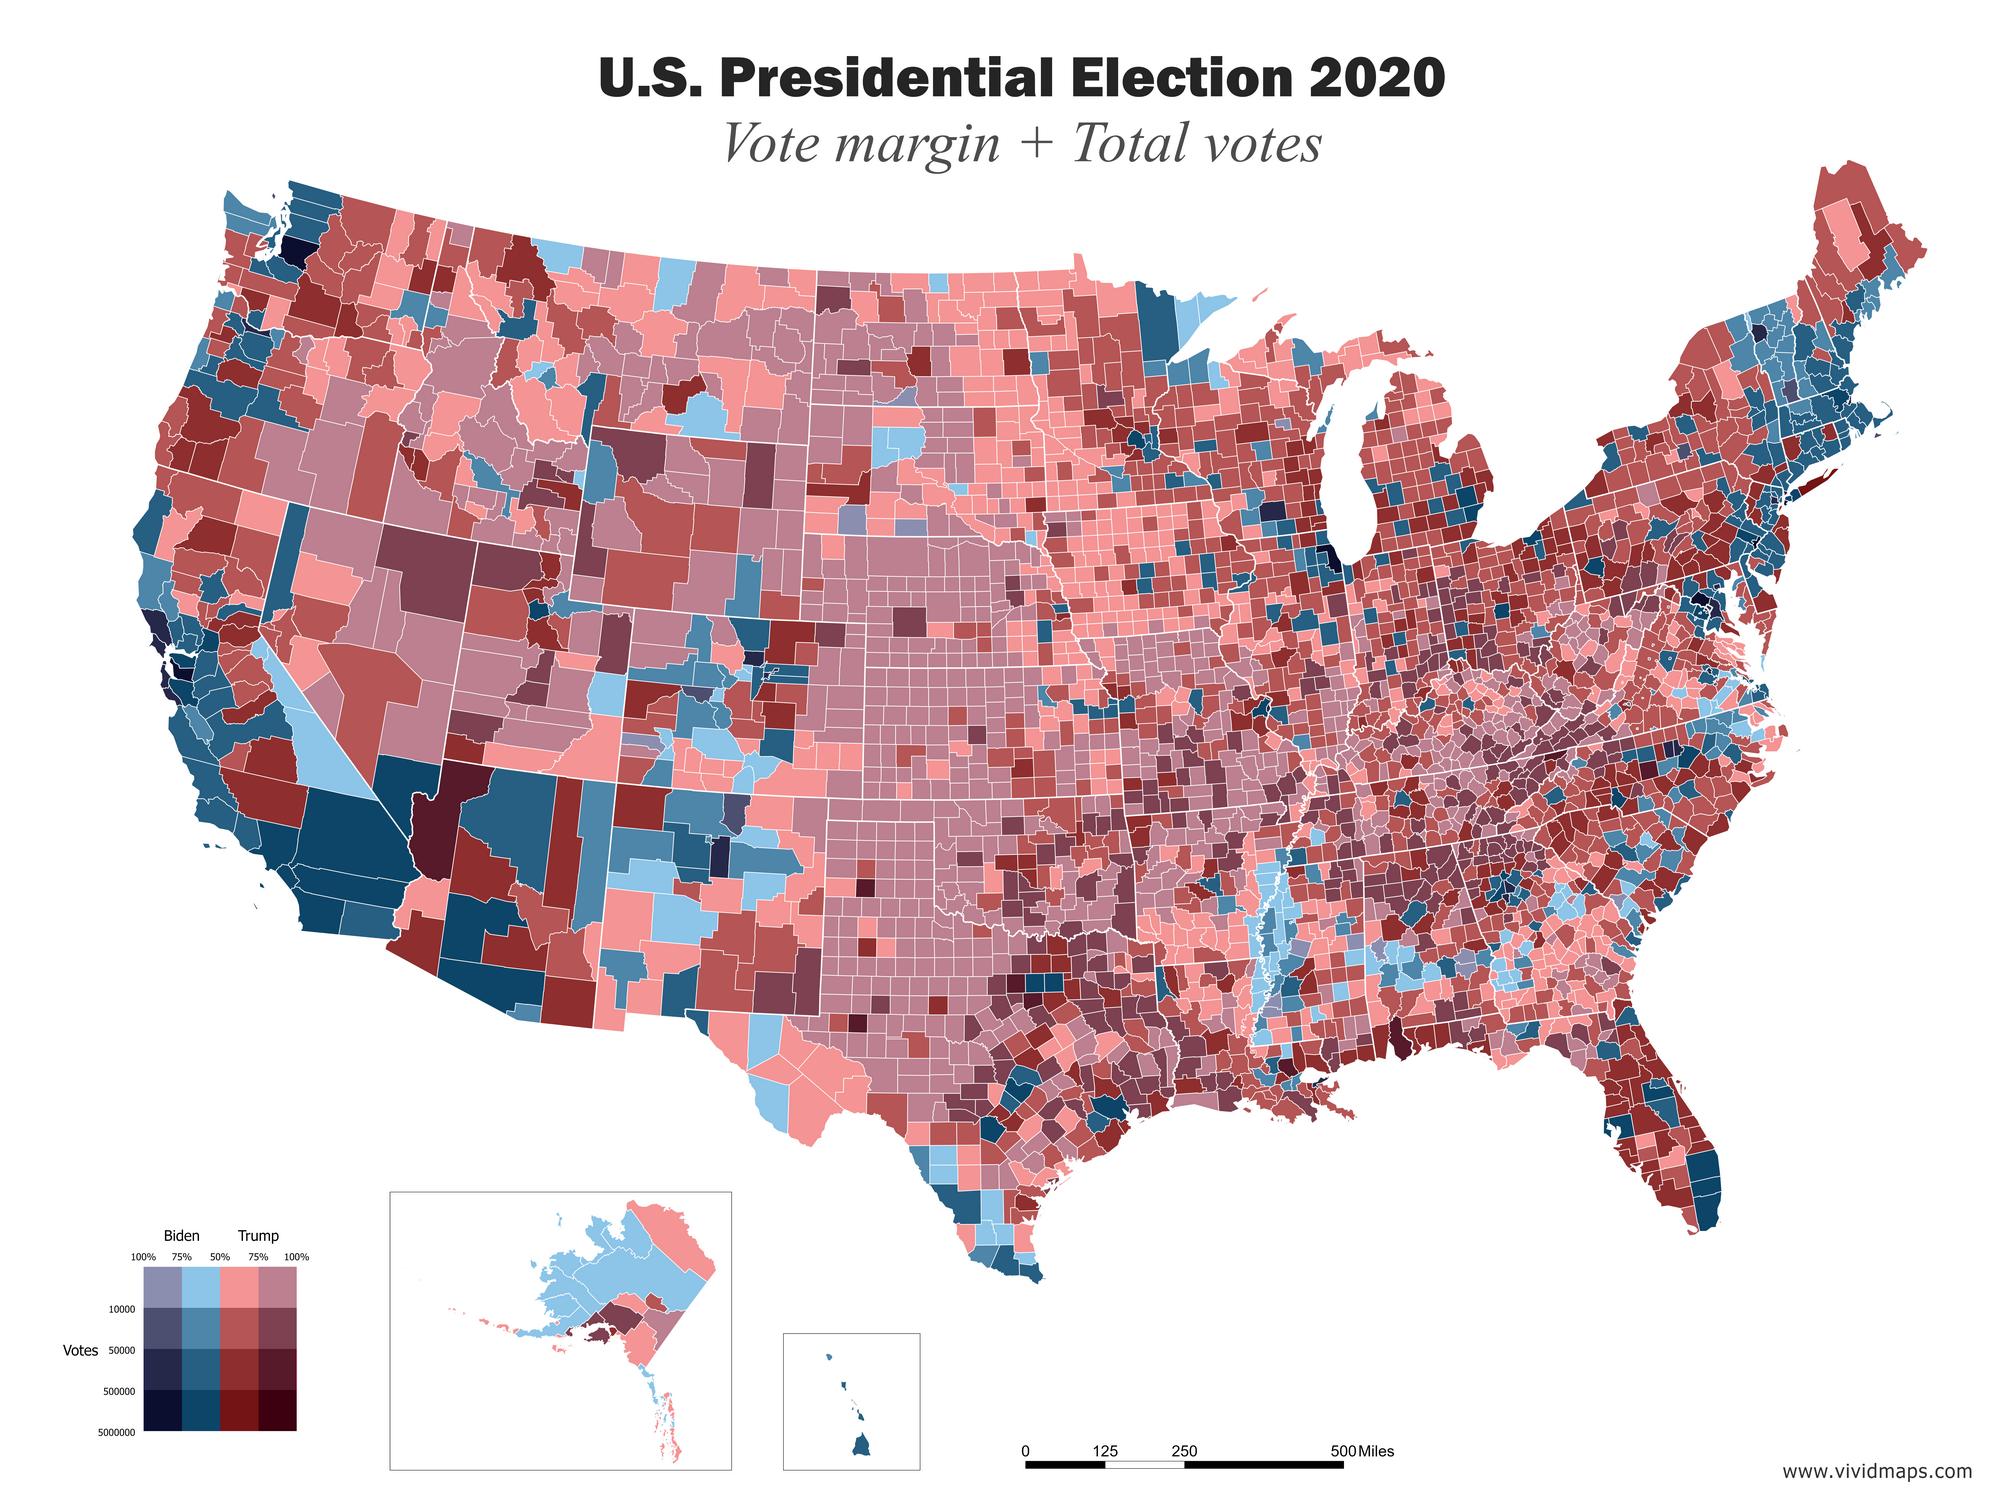 Map of U.S. Presidential Election 2020 (Vote margin + Total Votes)